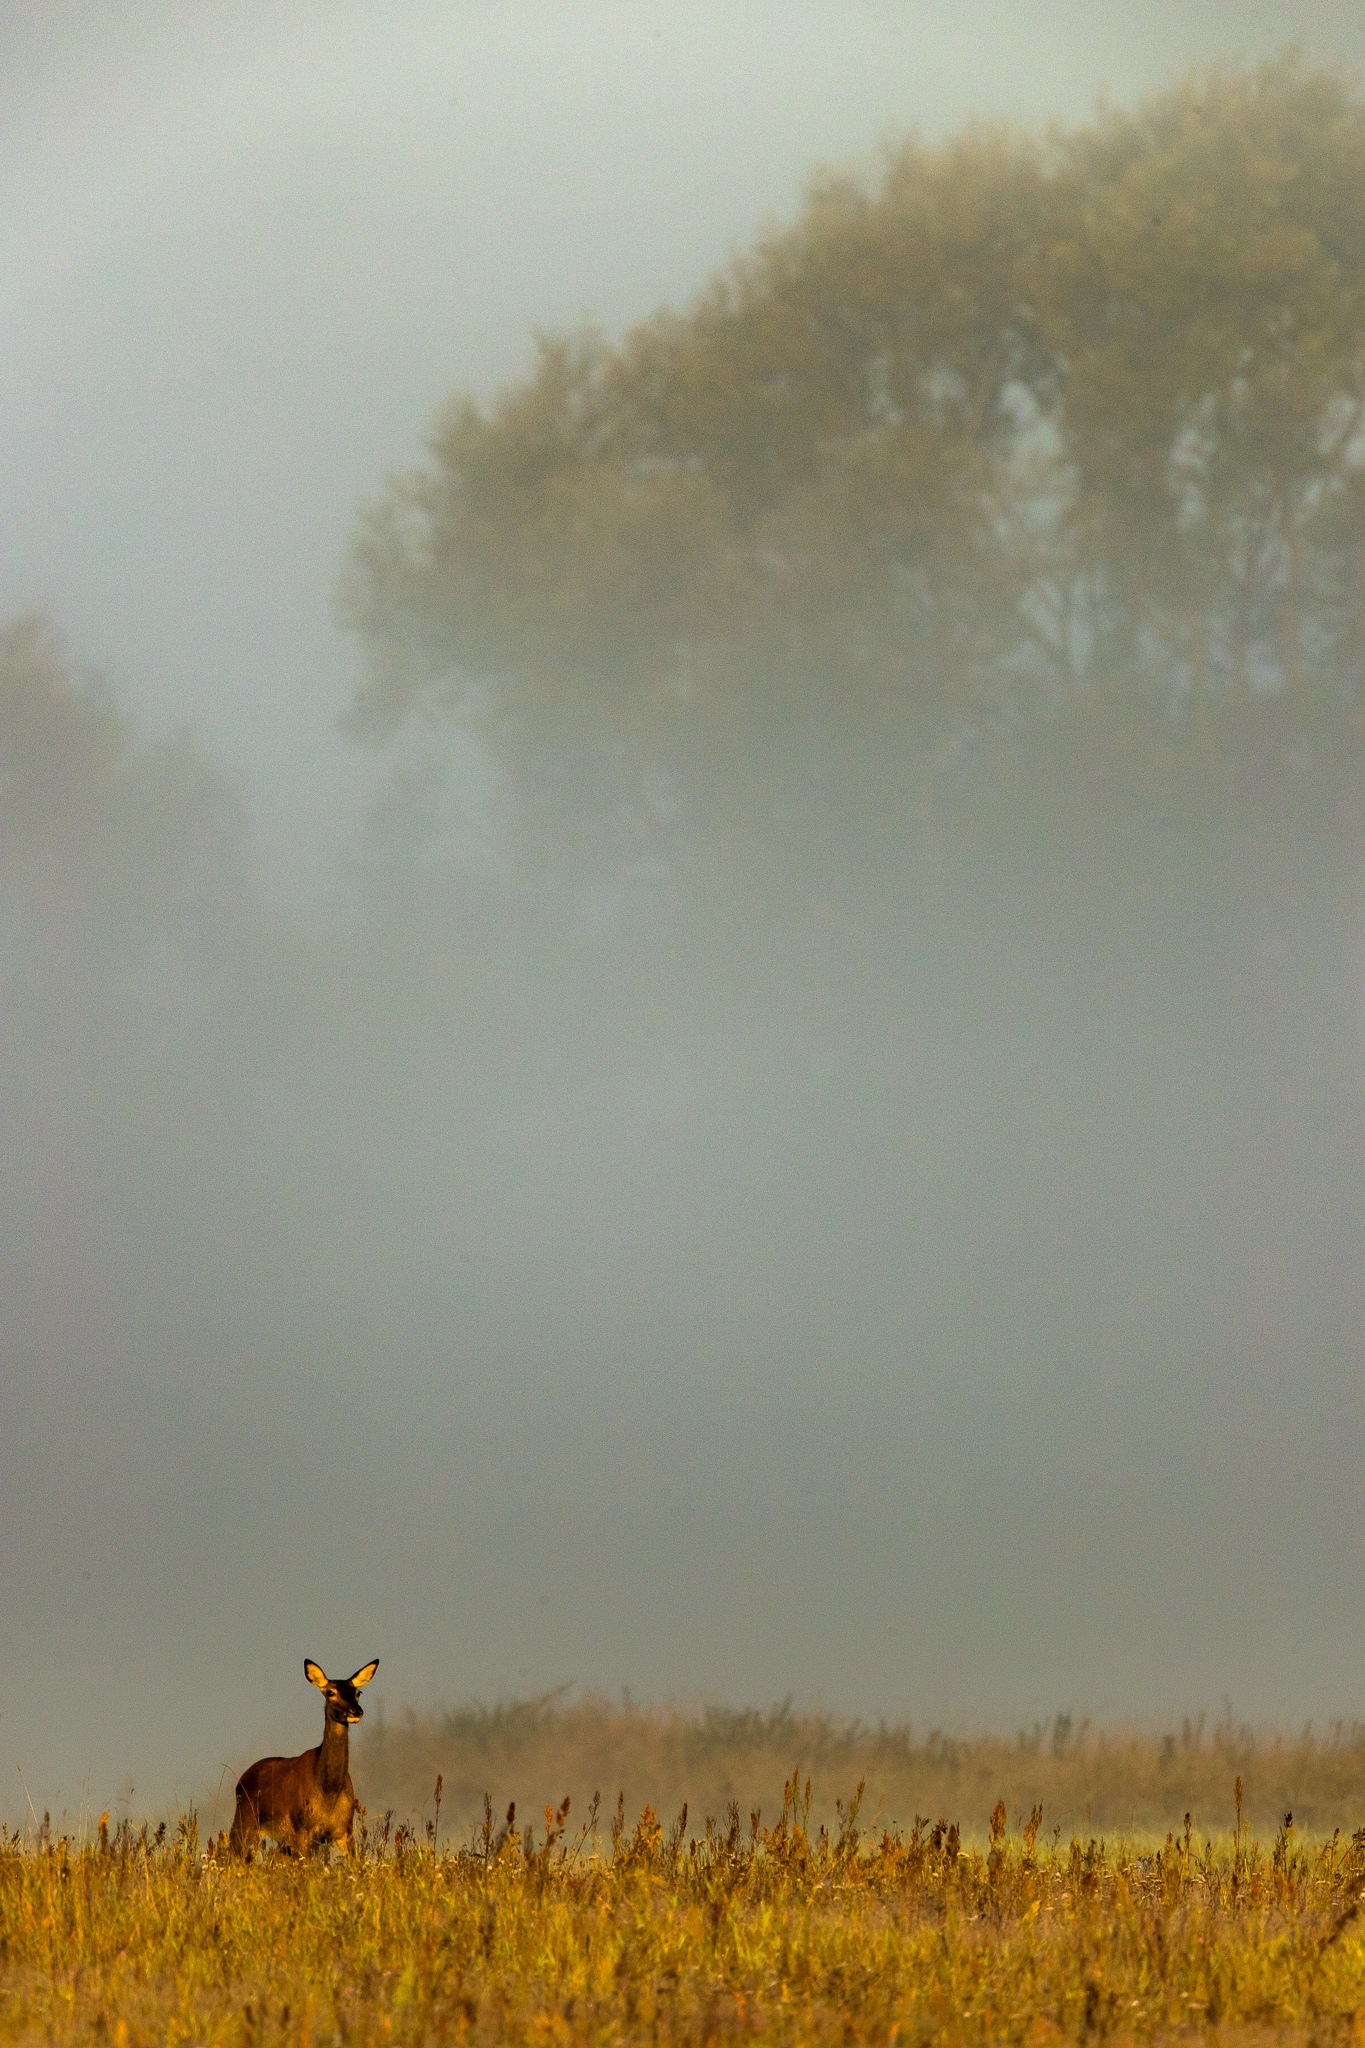 Autumn morning by Håkan Liljenberg